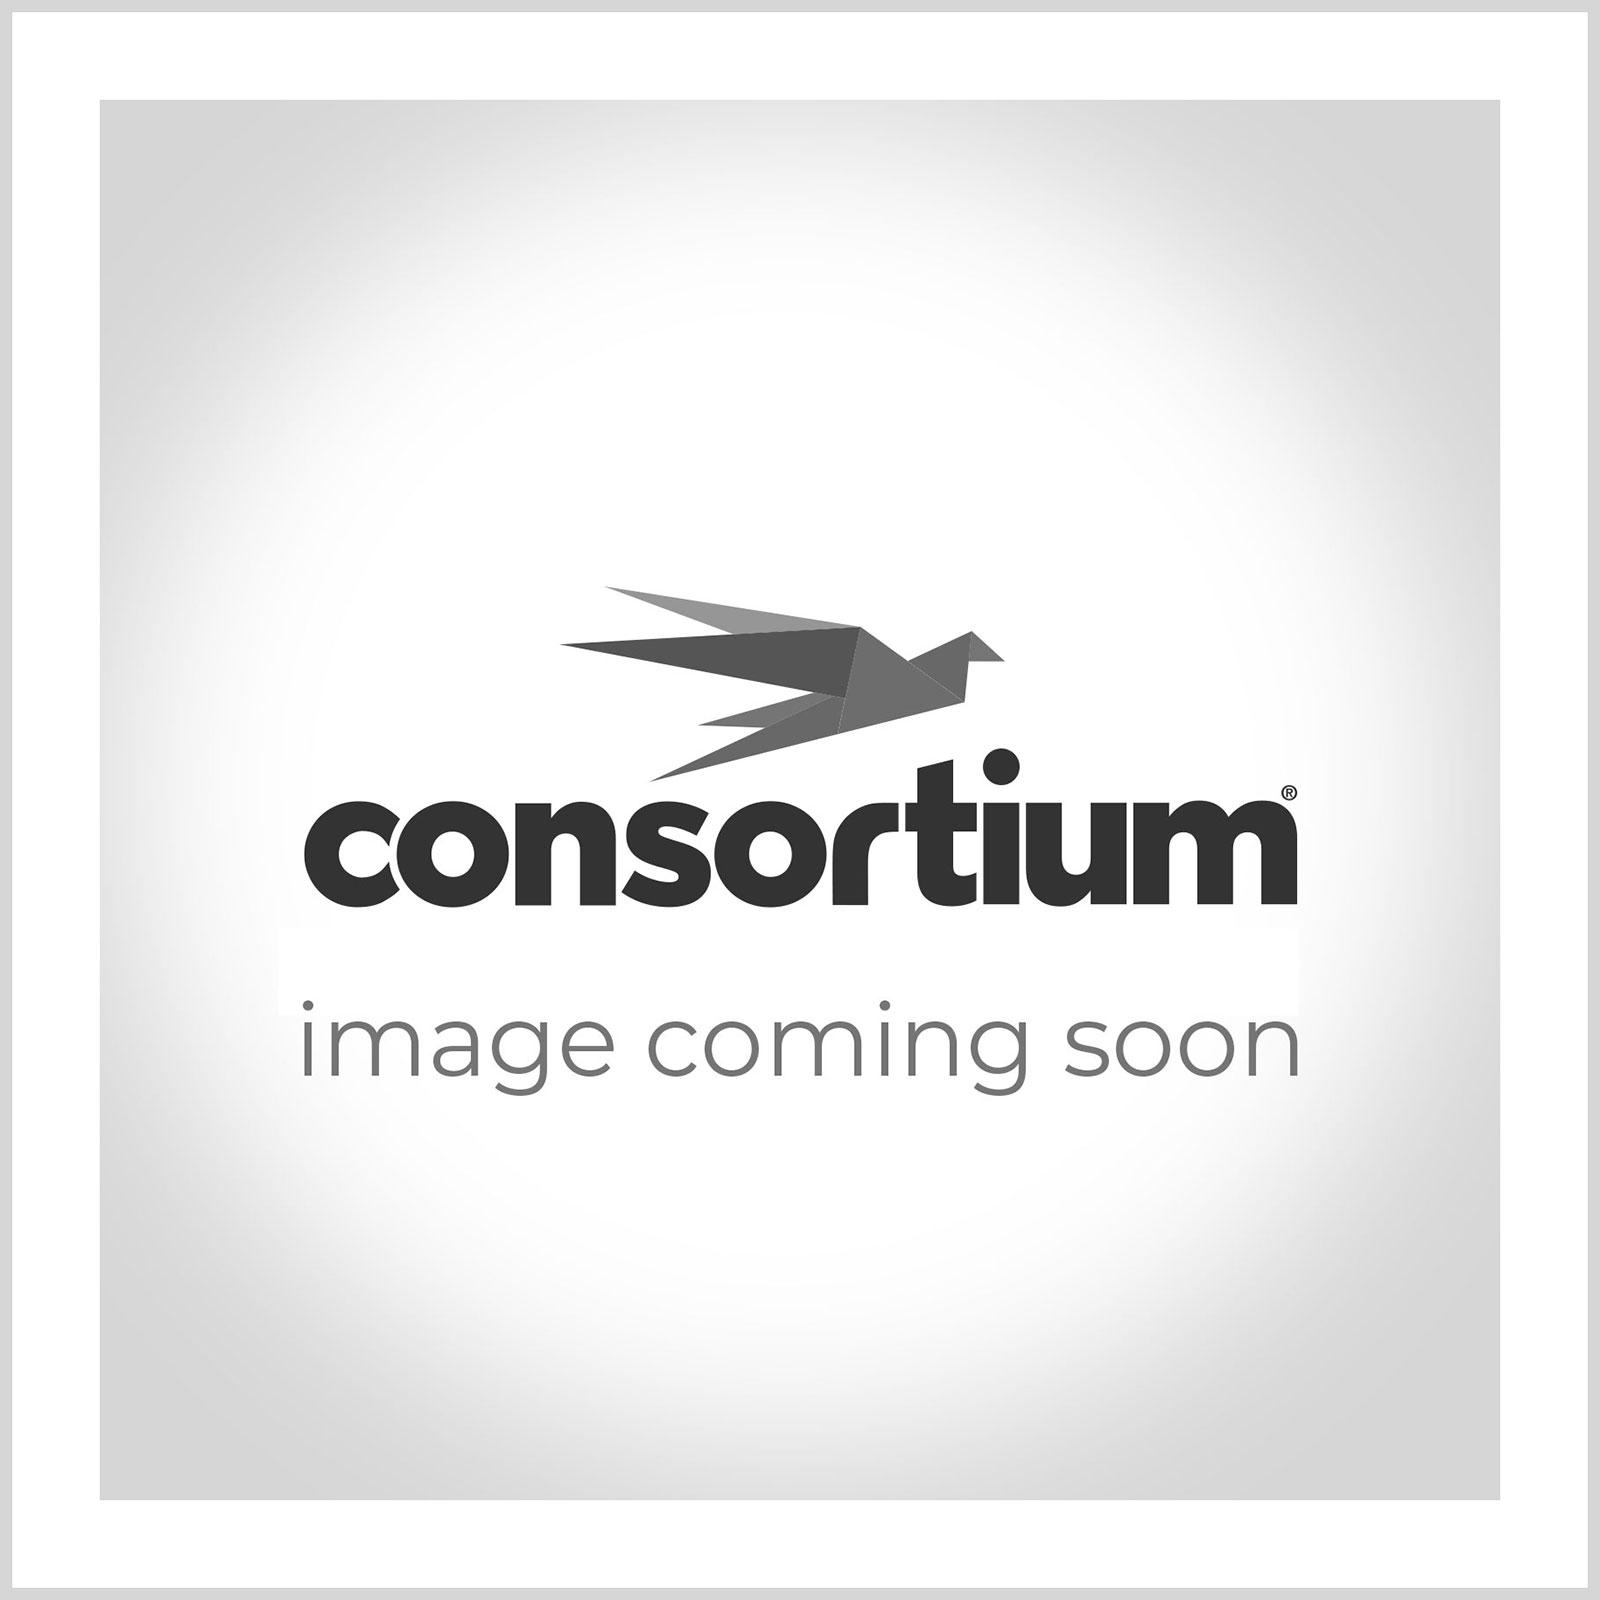 Nite-Glo Dry Powder Extinguisher